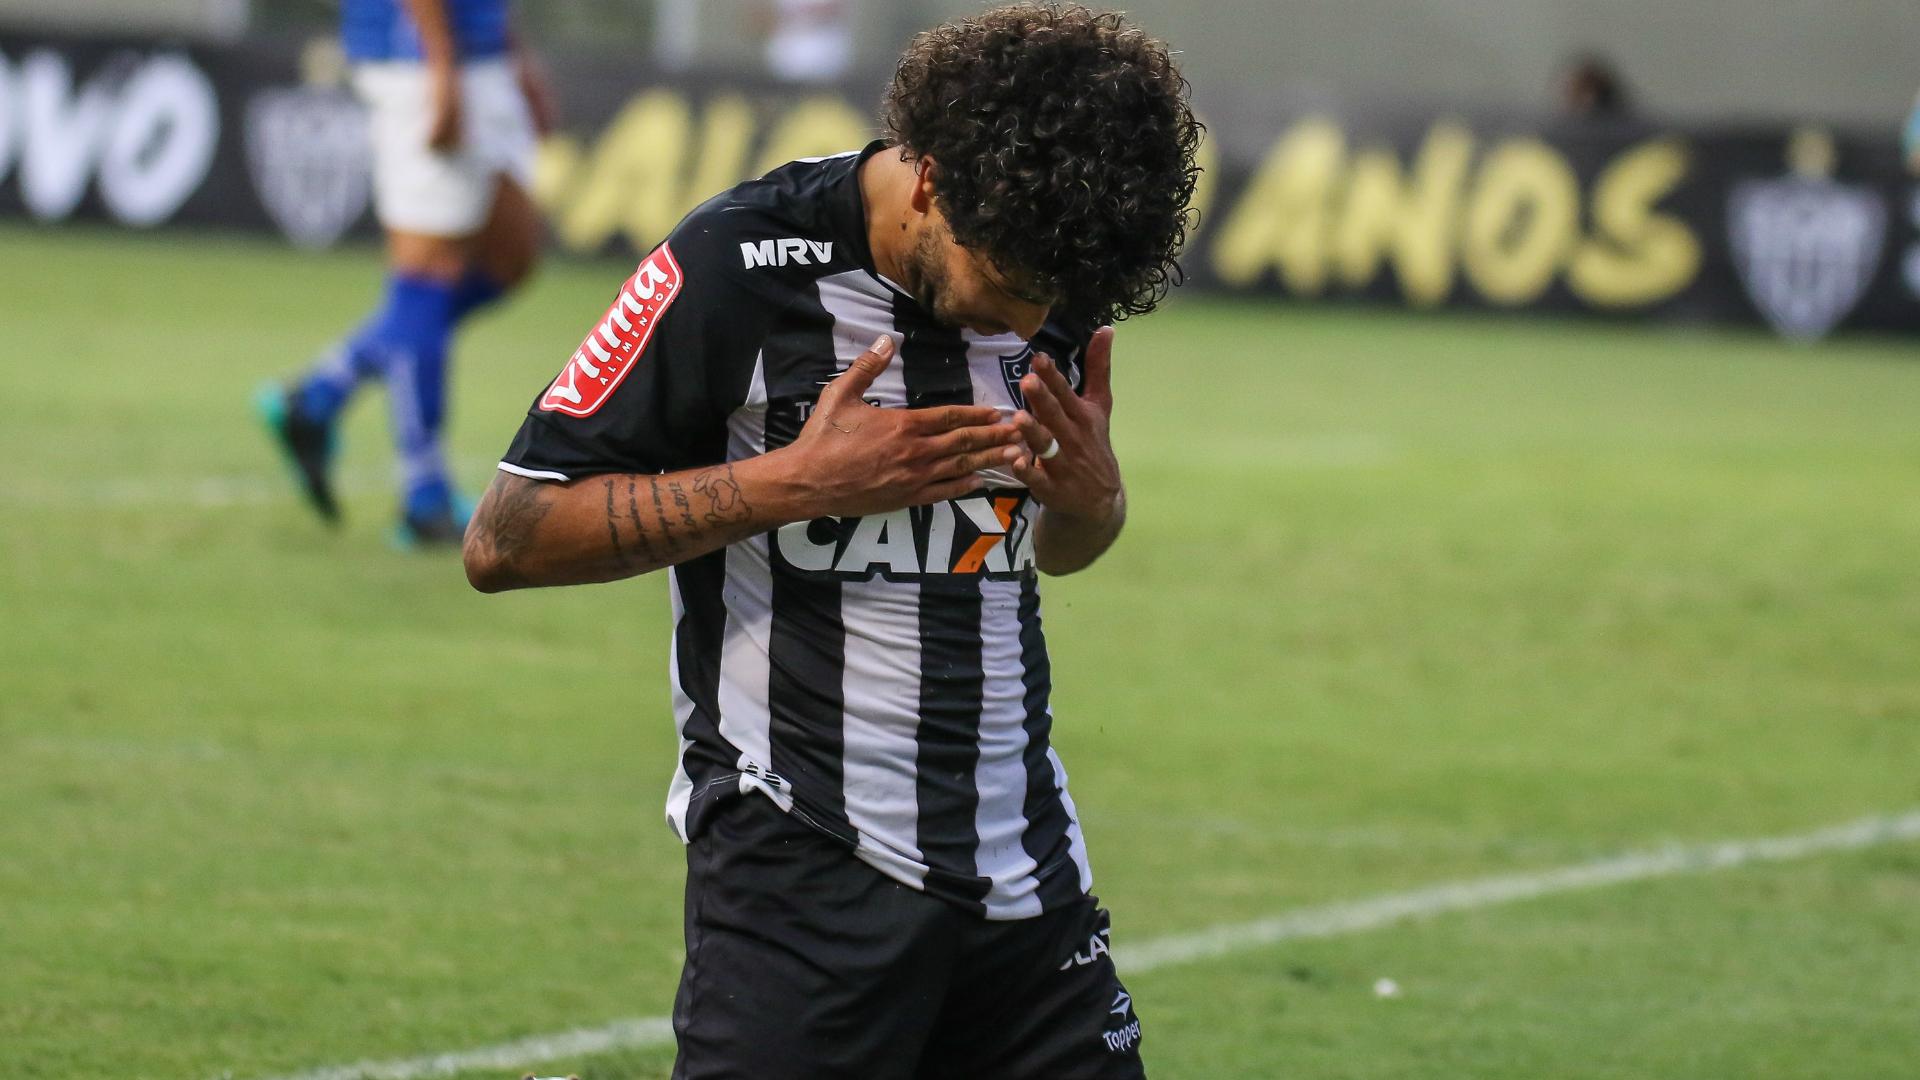 Luan Éder Aleixo Atlético-MG URT Campeonato Mineiro 26032017